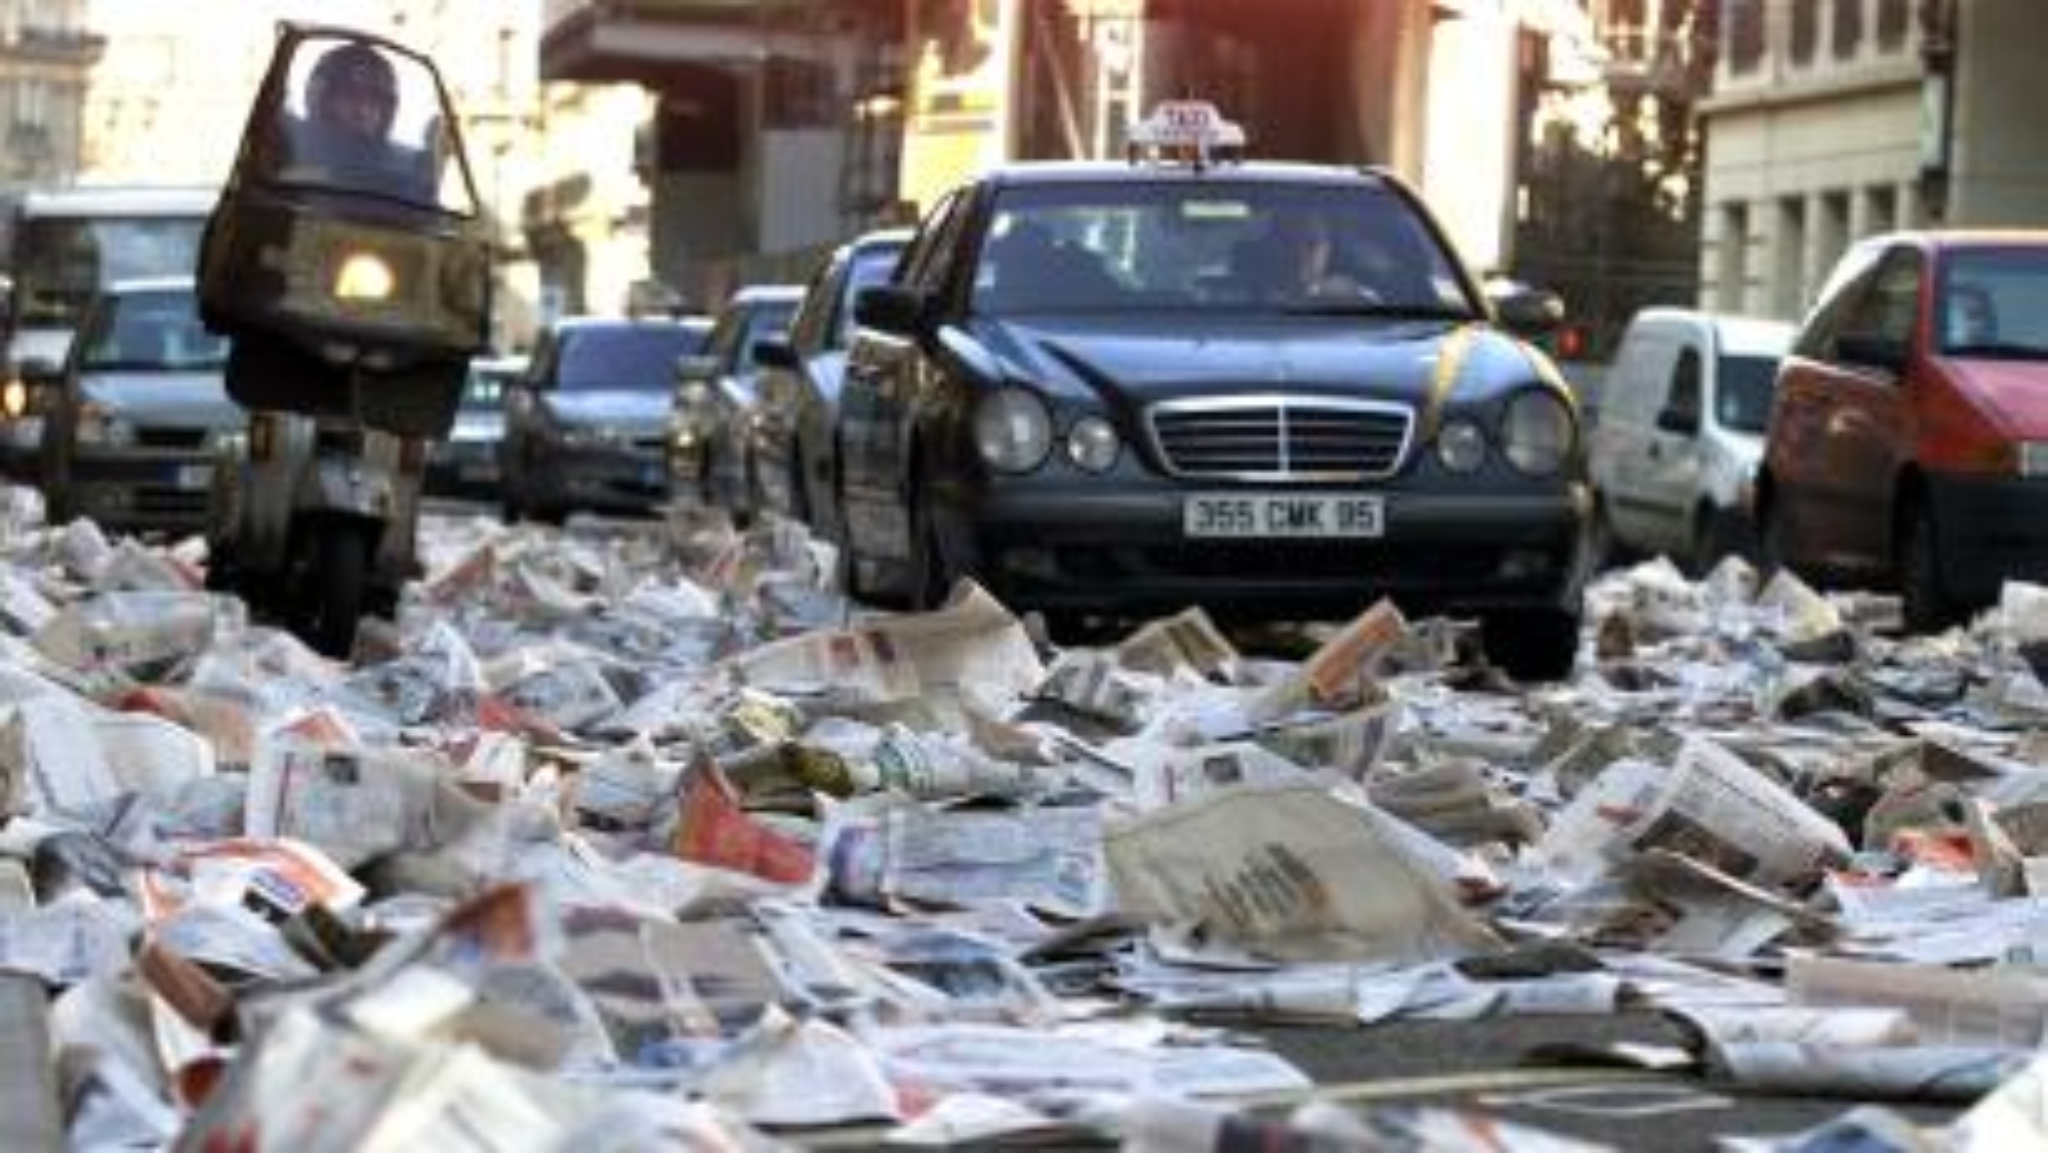 newspapers on ground